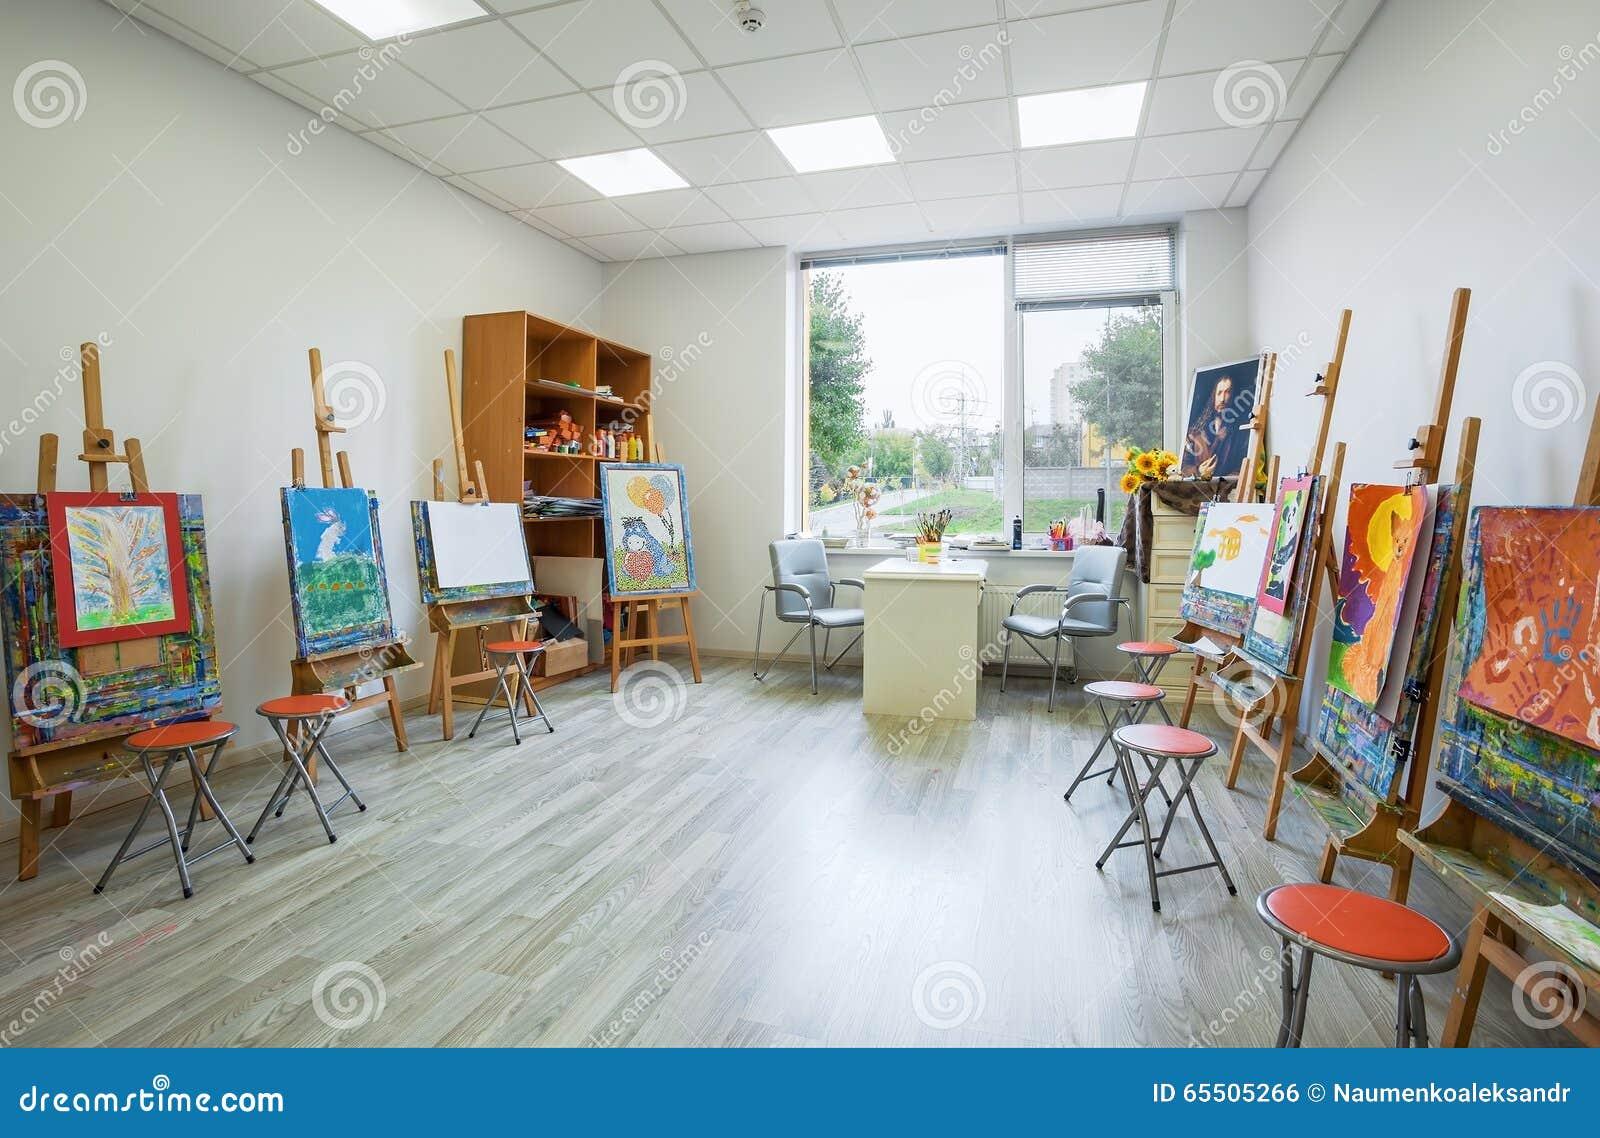 Academy Children Class Drawing Interior